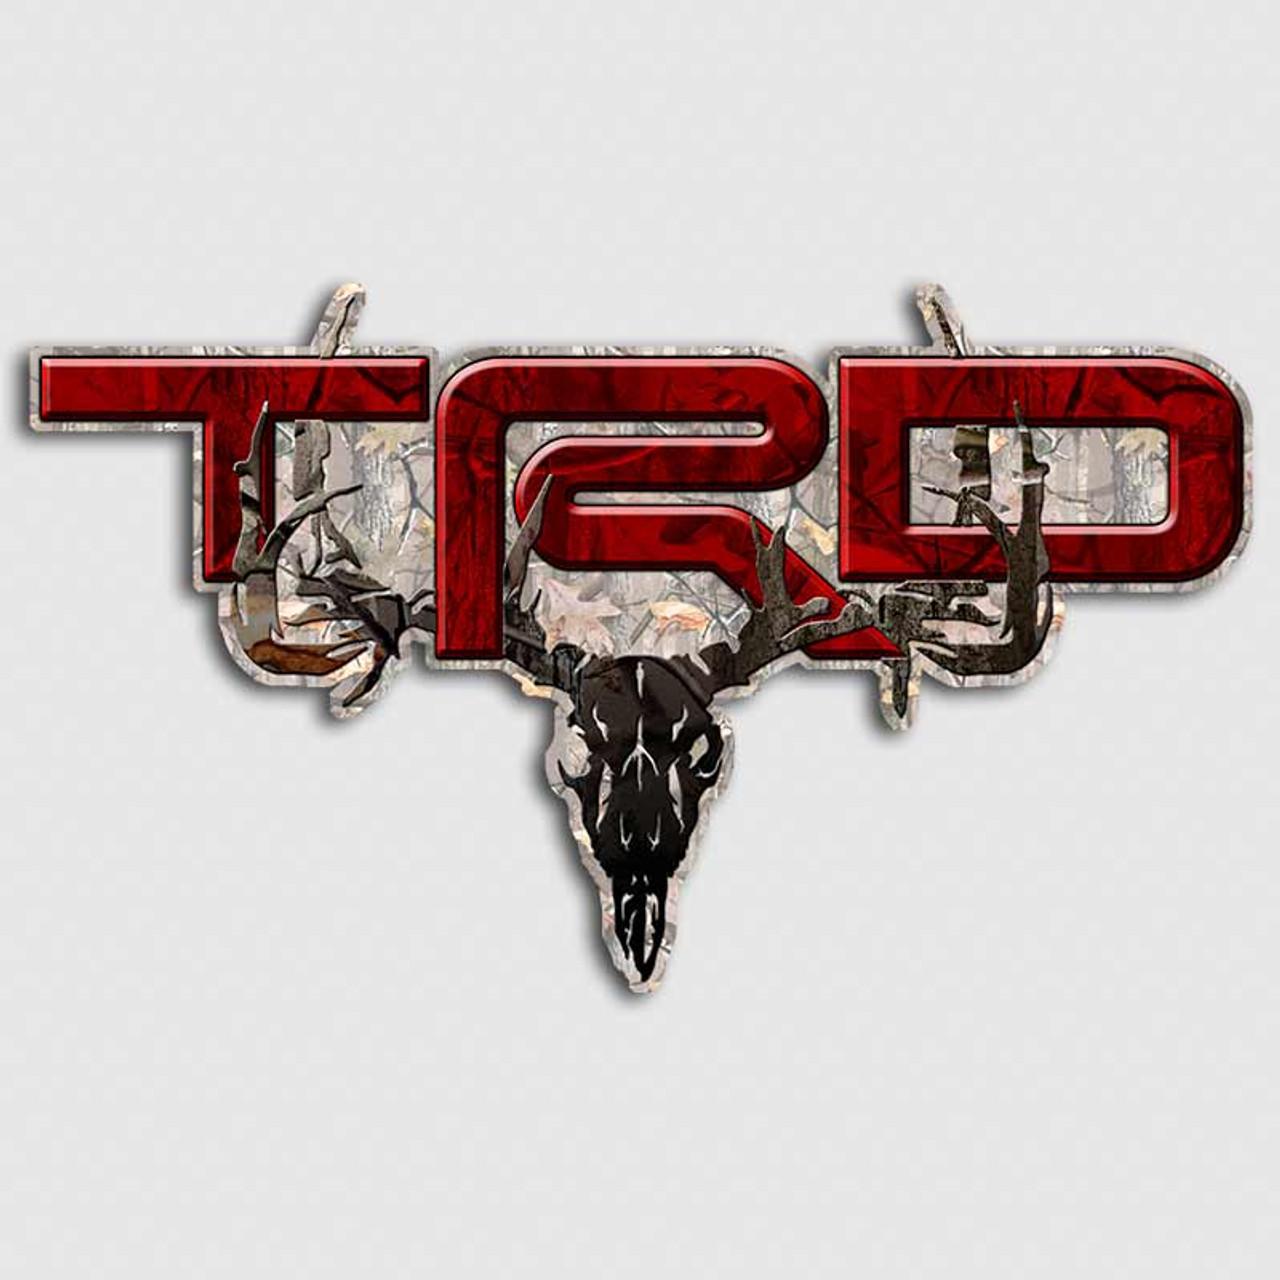 Red Camo TRD Deer Skull Tundra Truck Decals